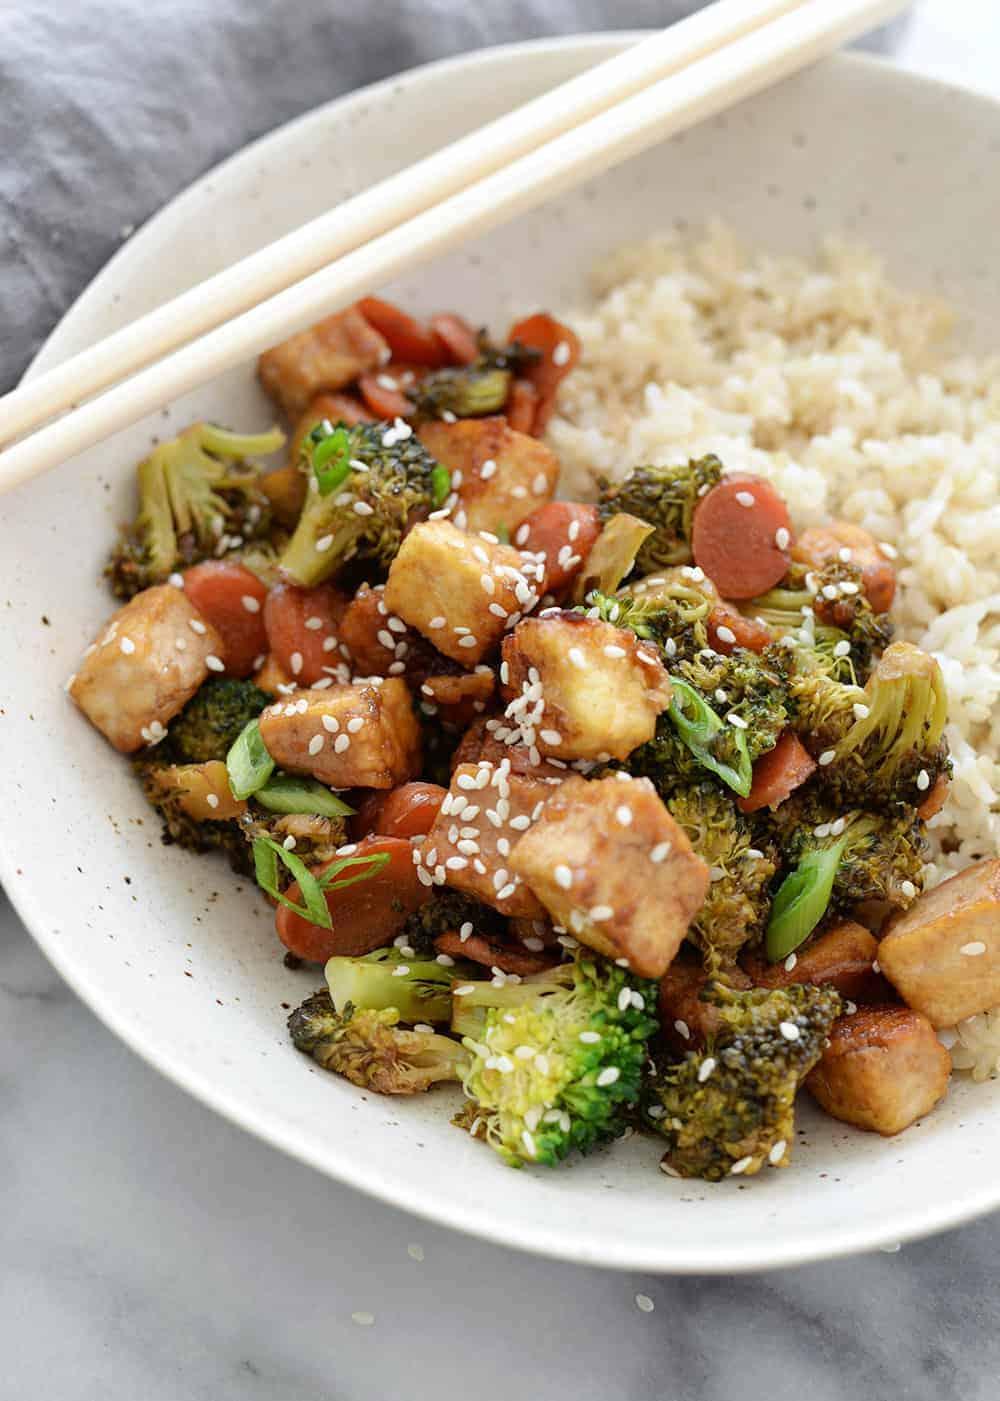 stir fry tofu broccoli and carrots